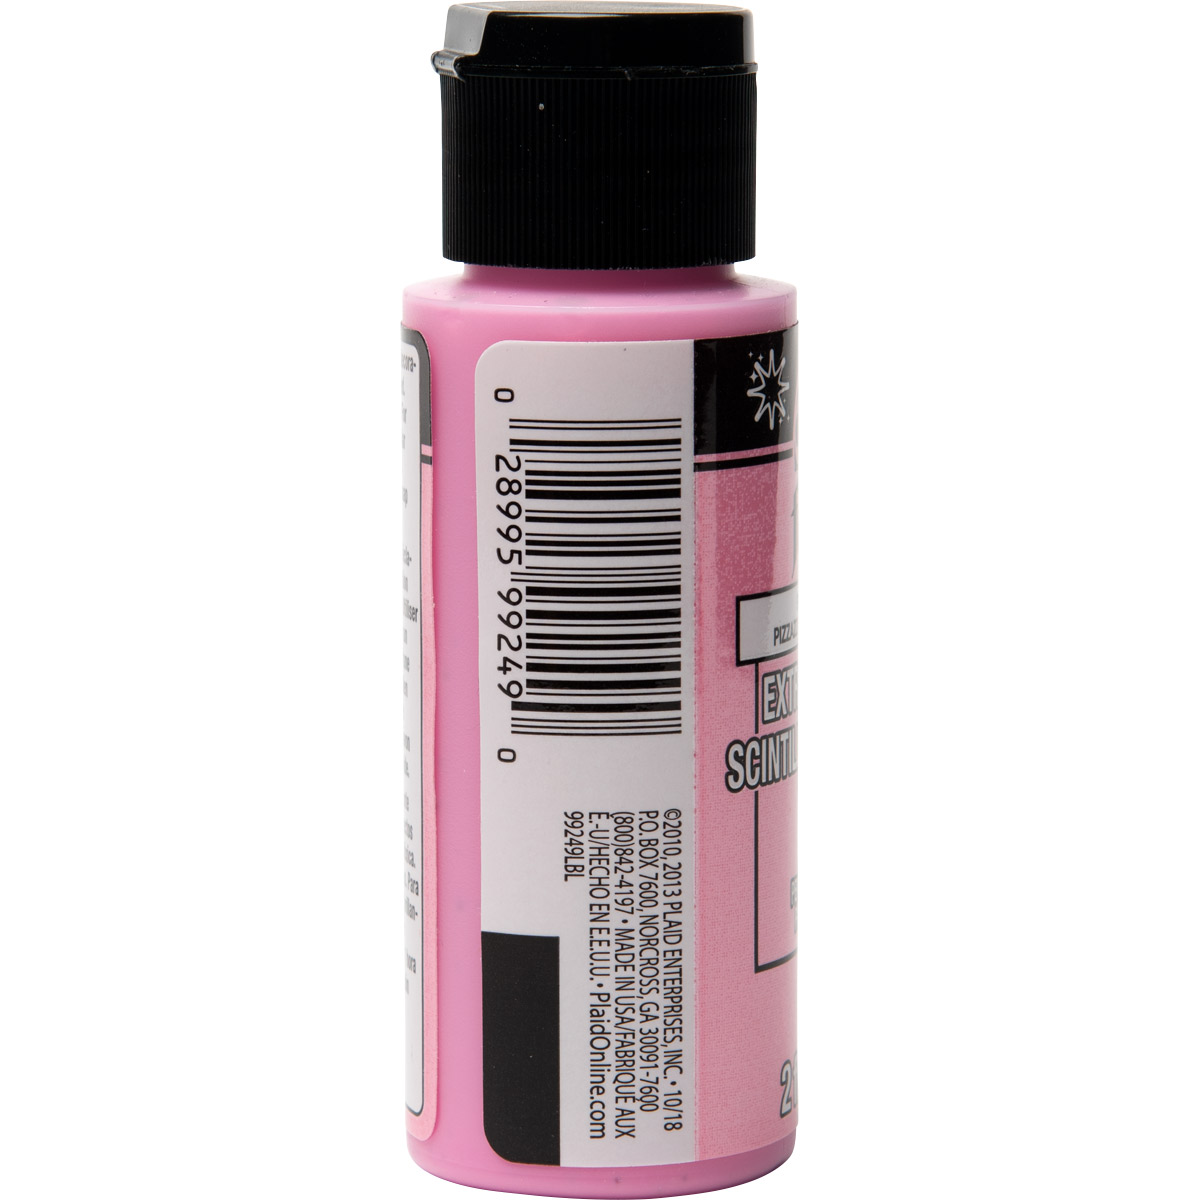 FolkArt ® Extreme Glitter™ - Pink Pizzazz, 2 oz. - 99249